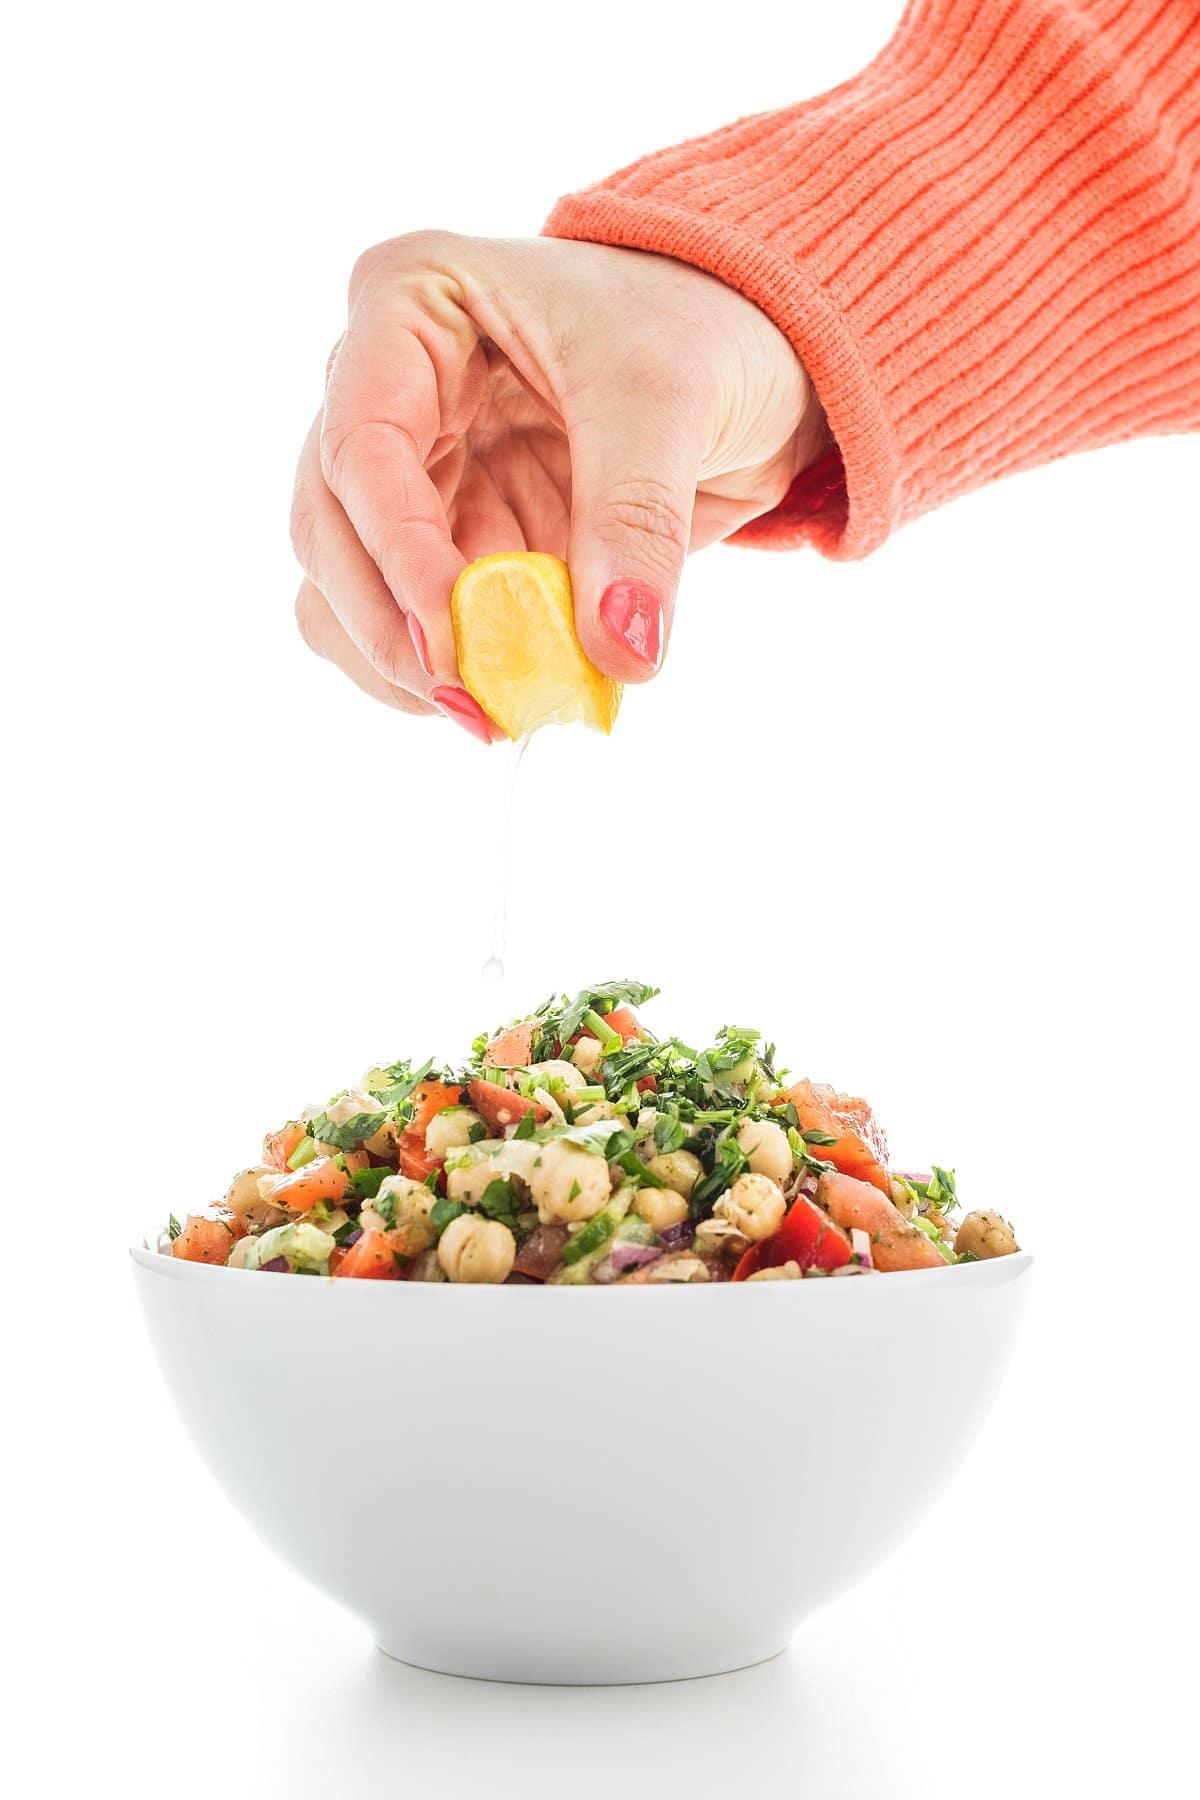 Liz squeezing lemon on chickpea salad